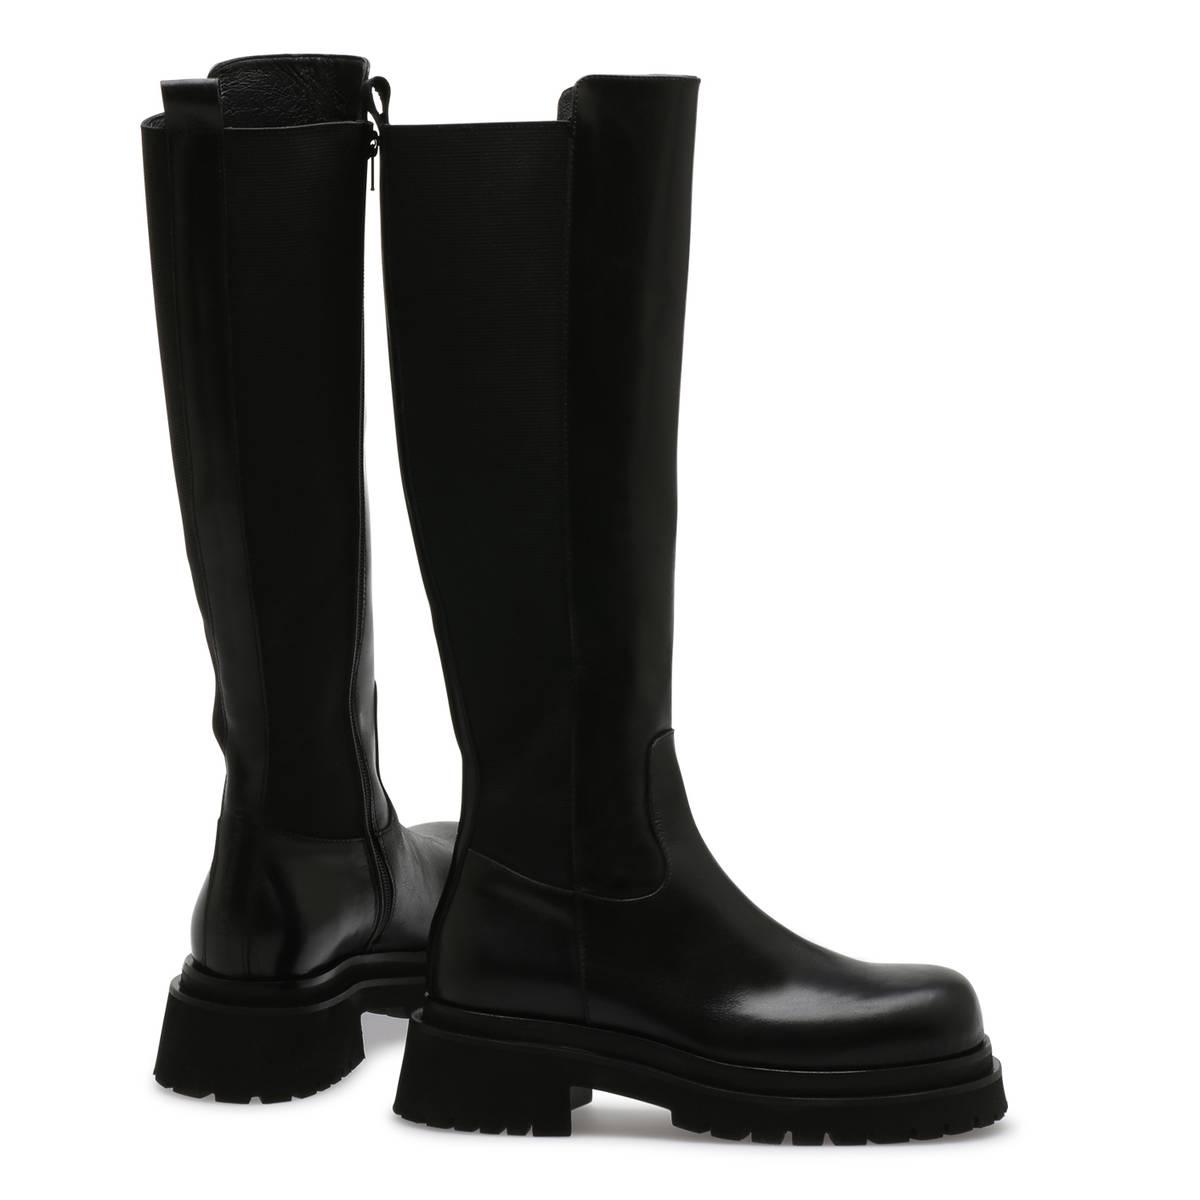 NUDE - Ulrika Long Boots Tequila / Nero